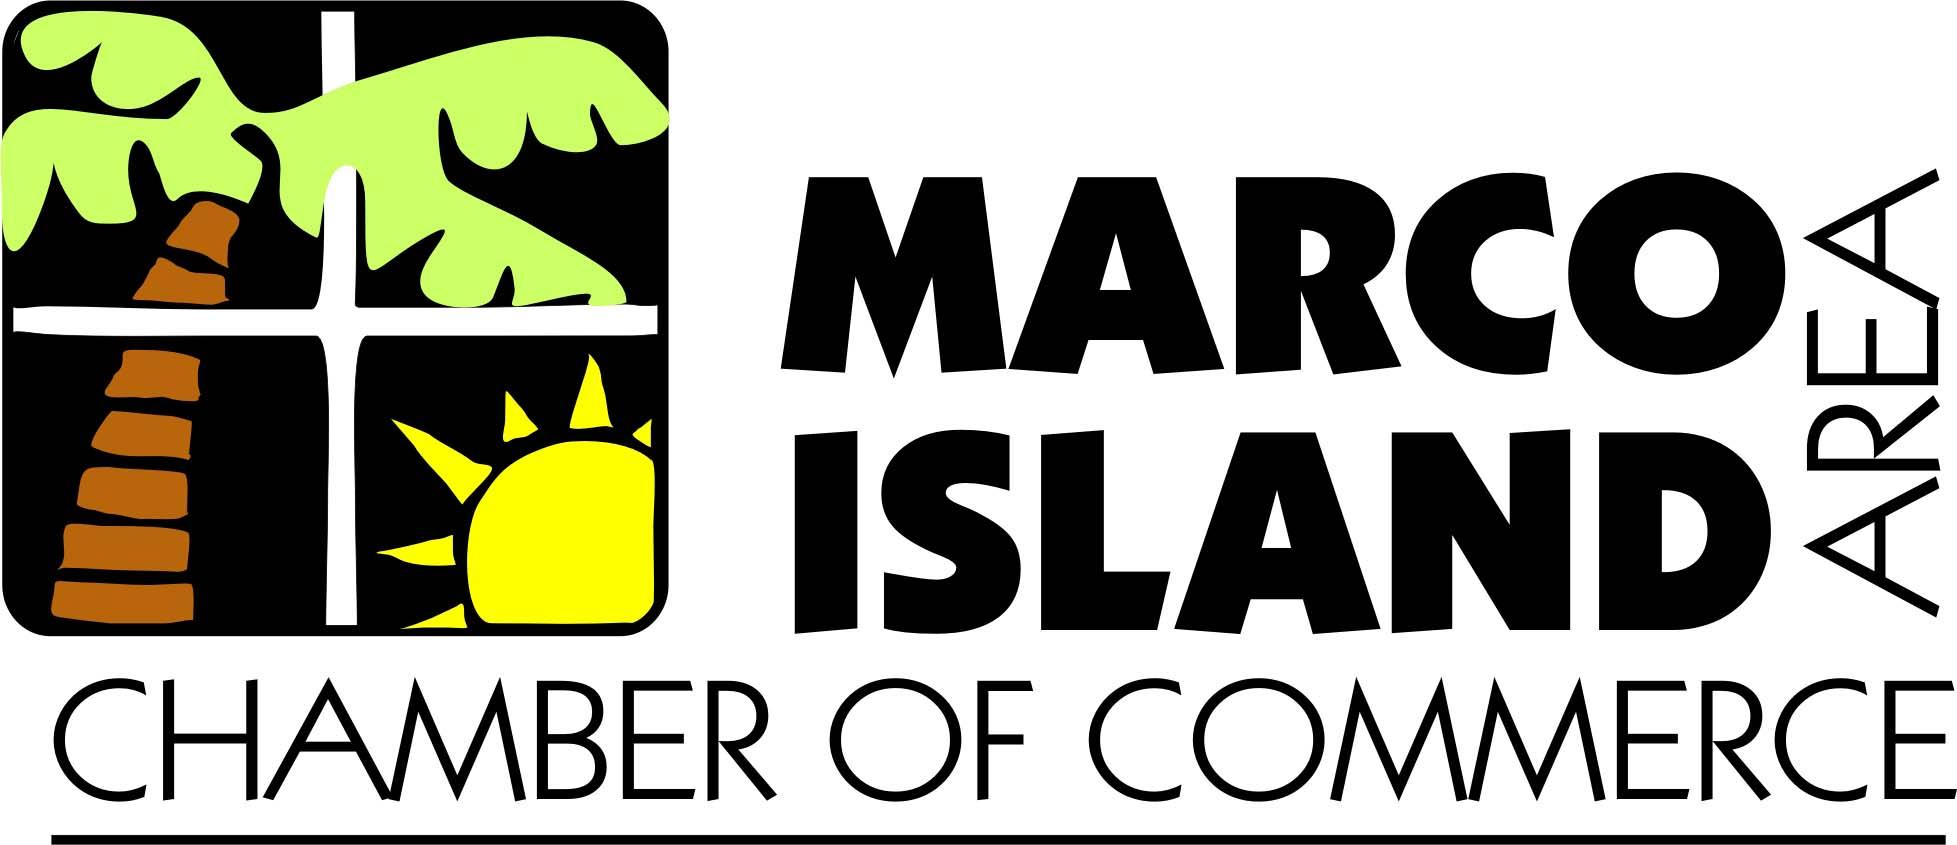 Marco Island Chamber of Commerce